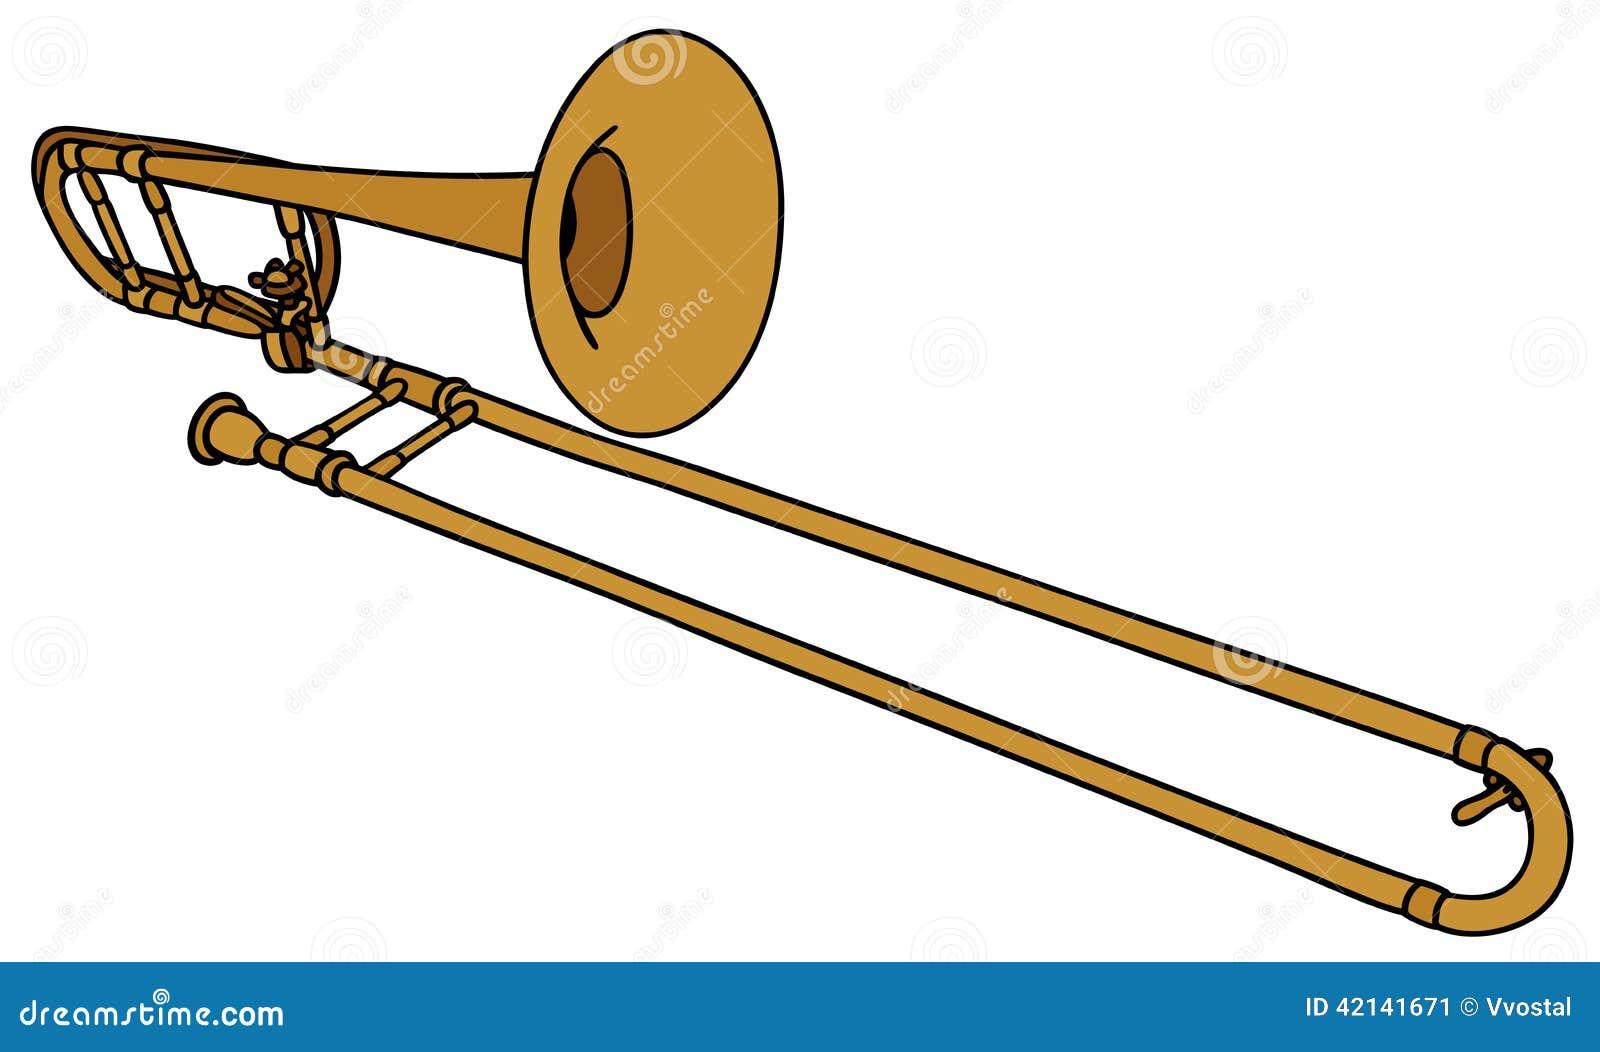 Trombone Stock Vector - Image: 42141671  Trombone Stock ...